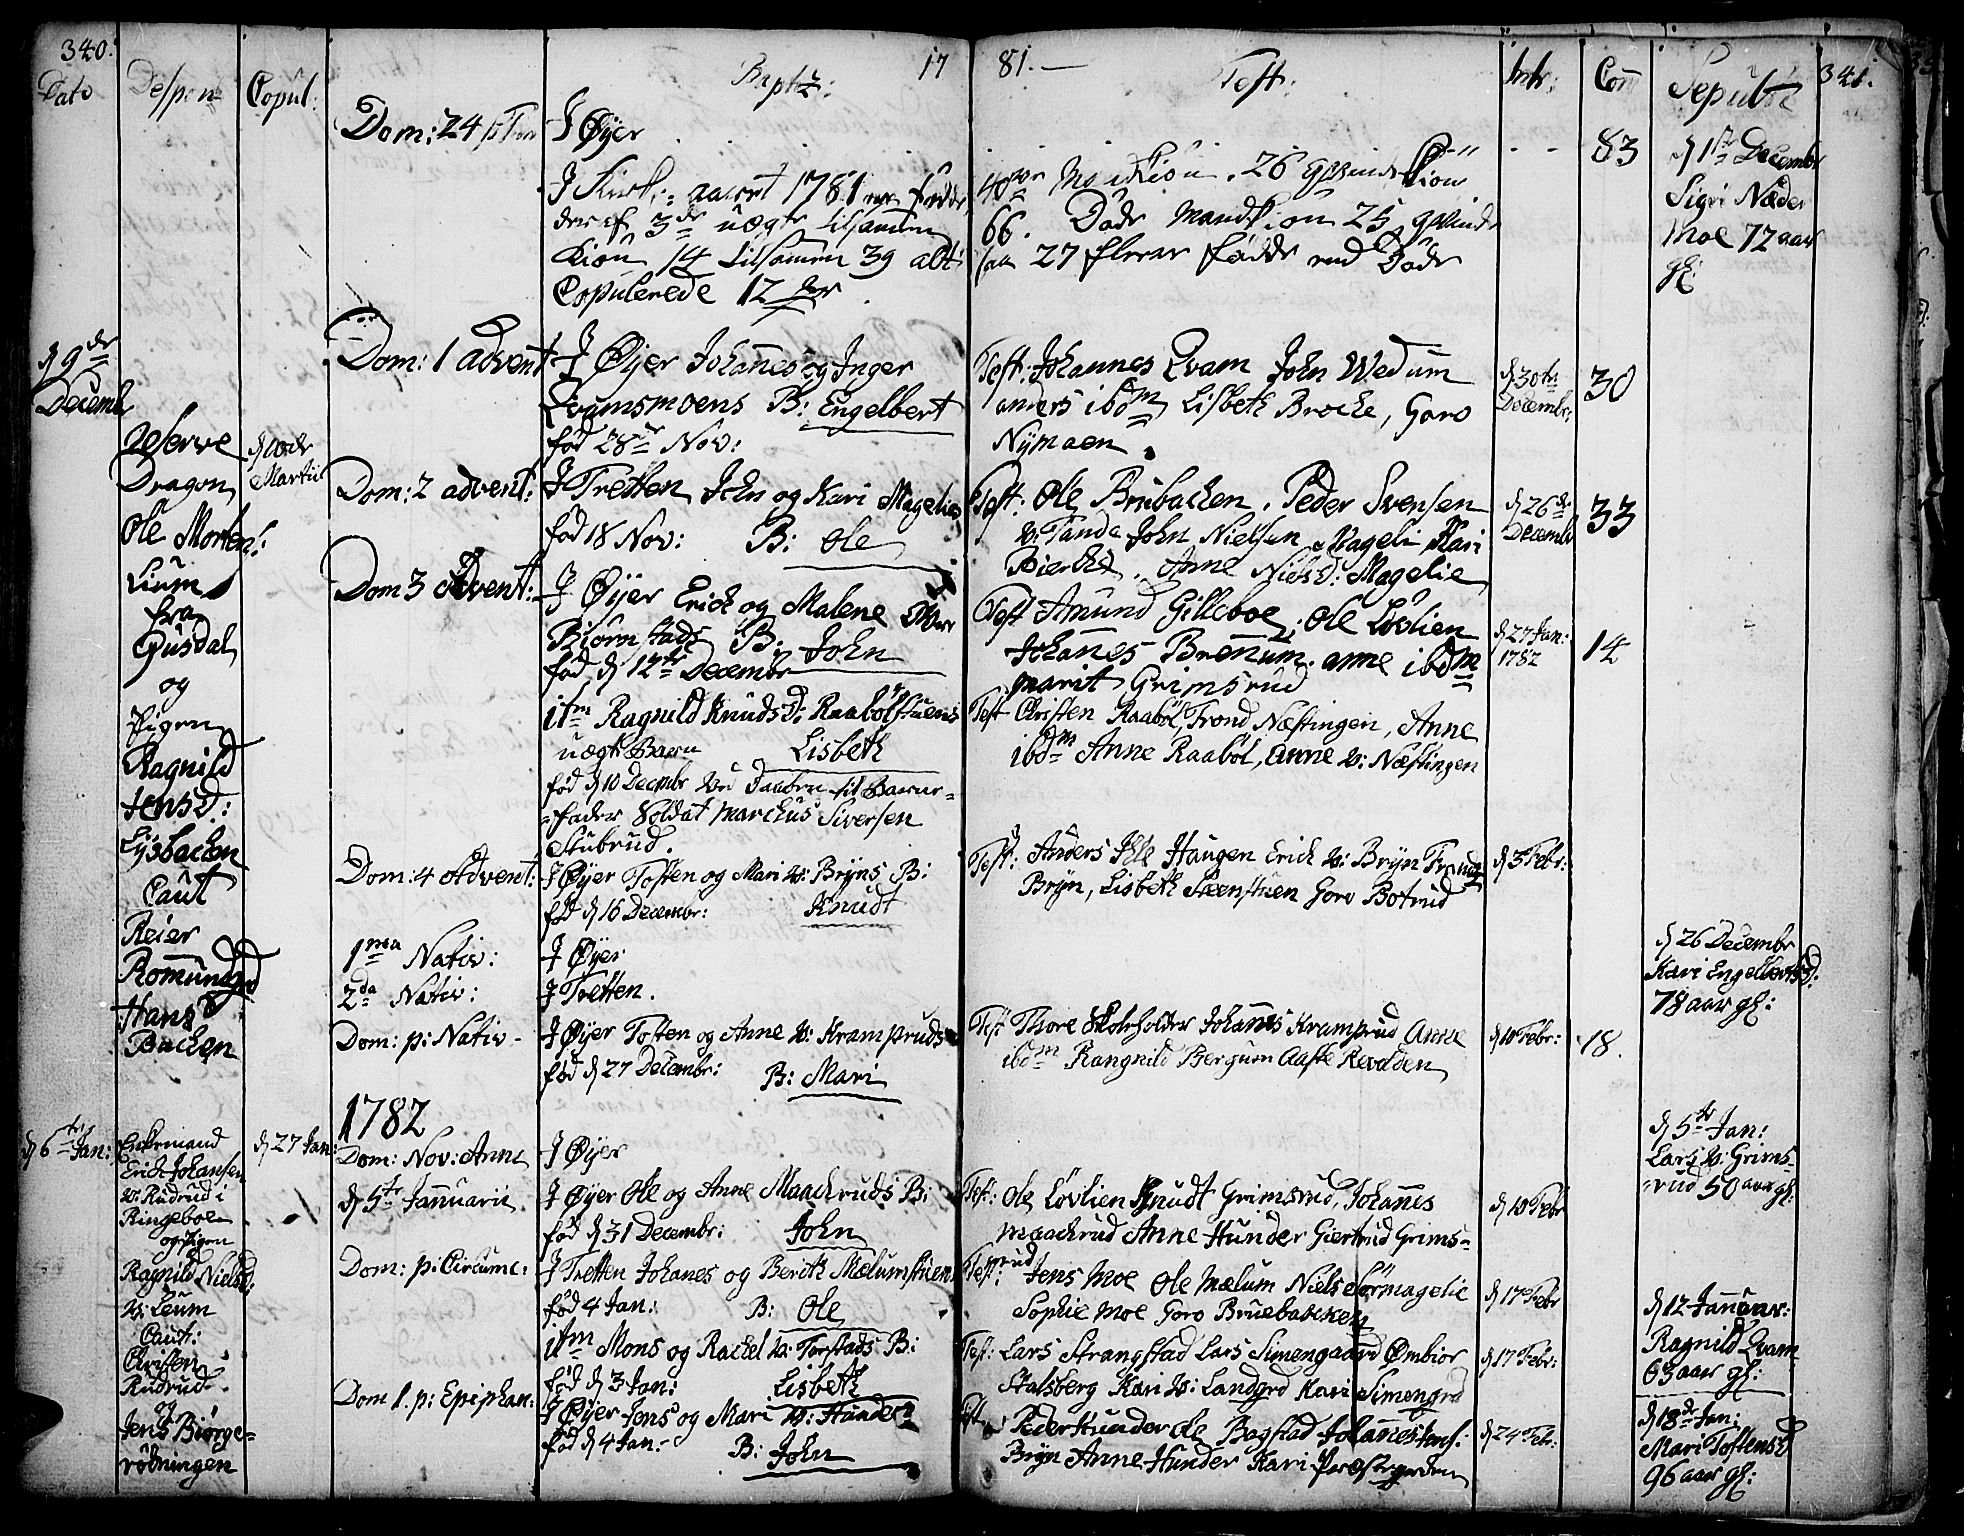 SAH, Øyer prestekontor, Ministerialbok nr. 2, 1733-1784, s. 340-341